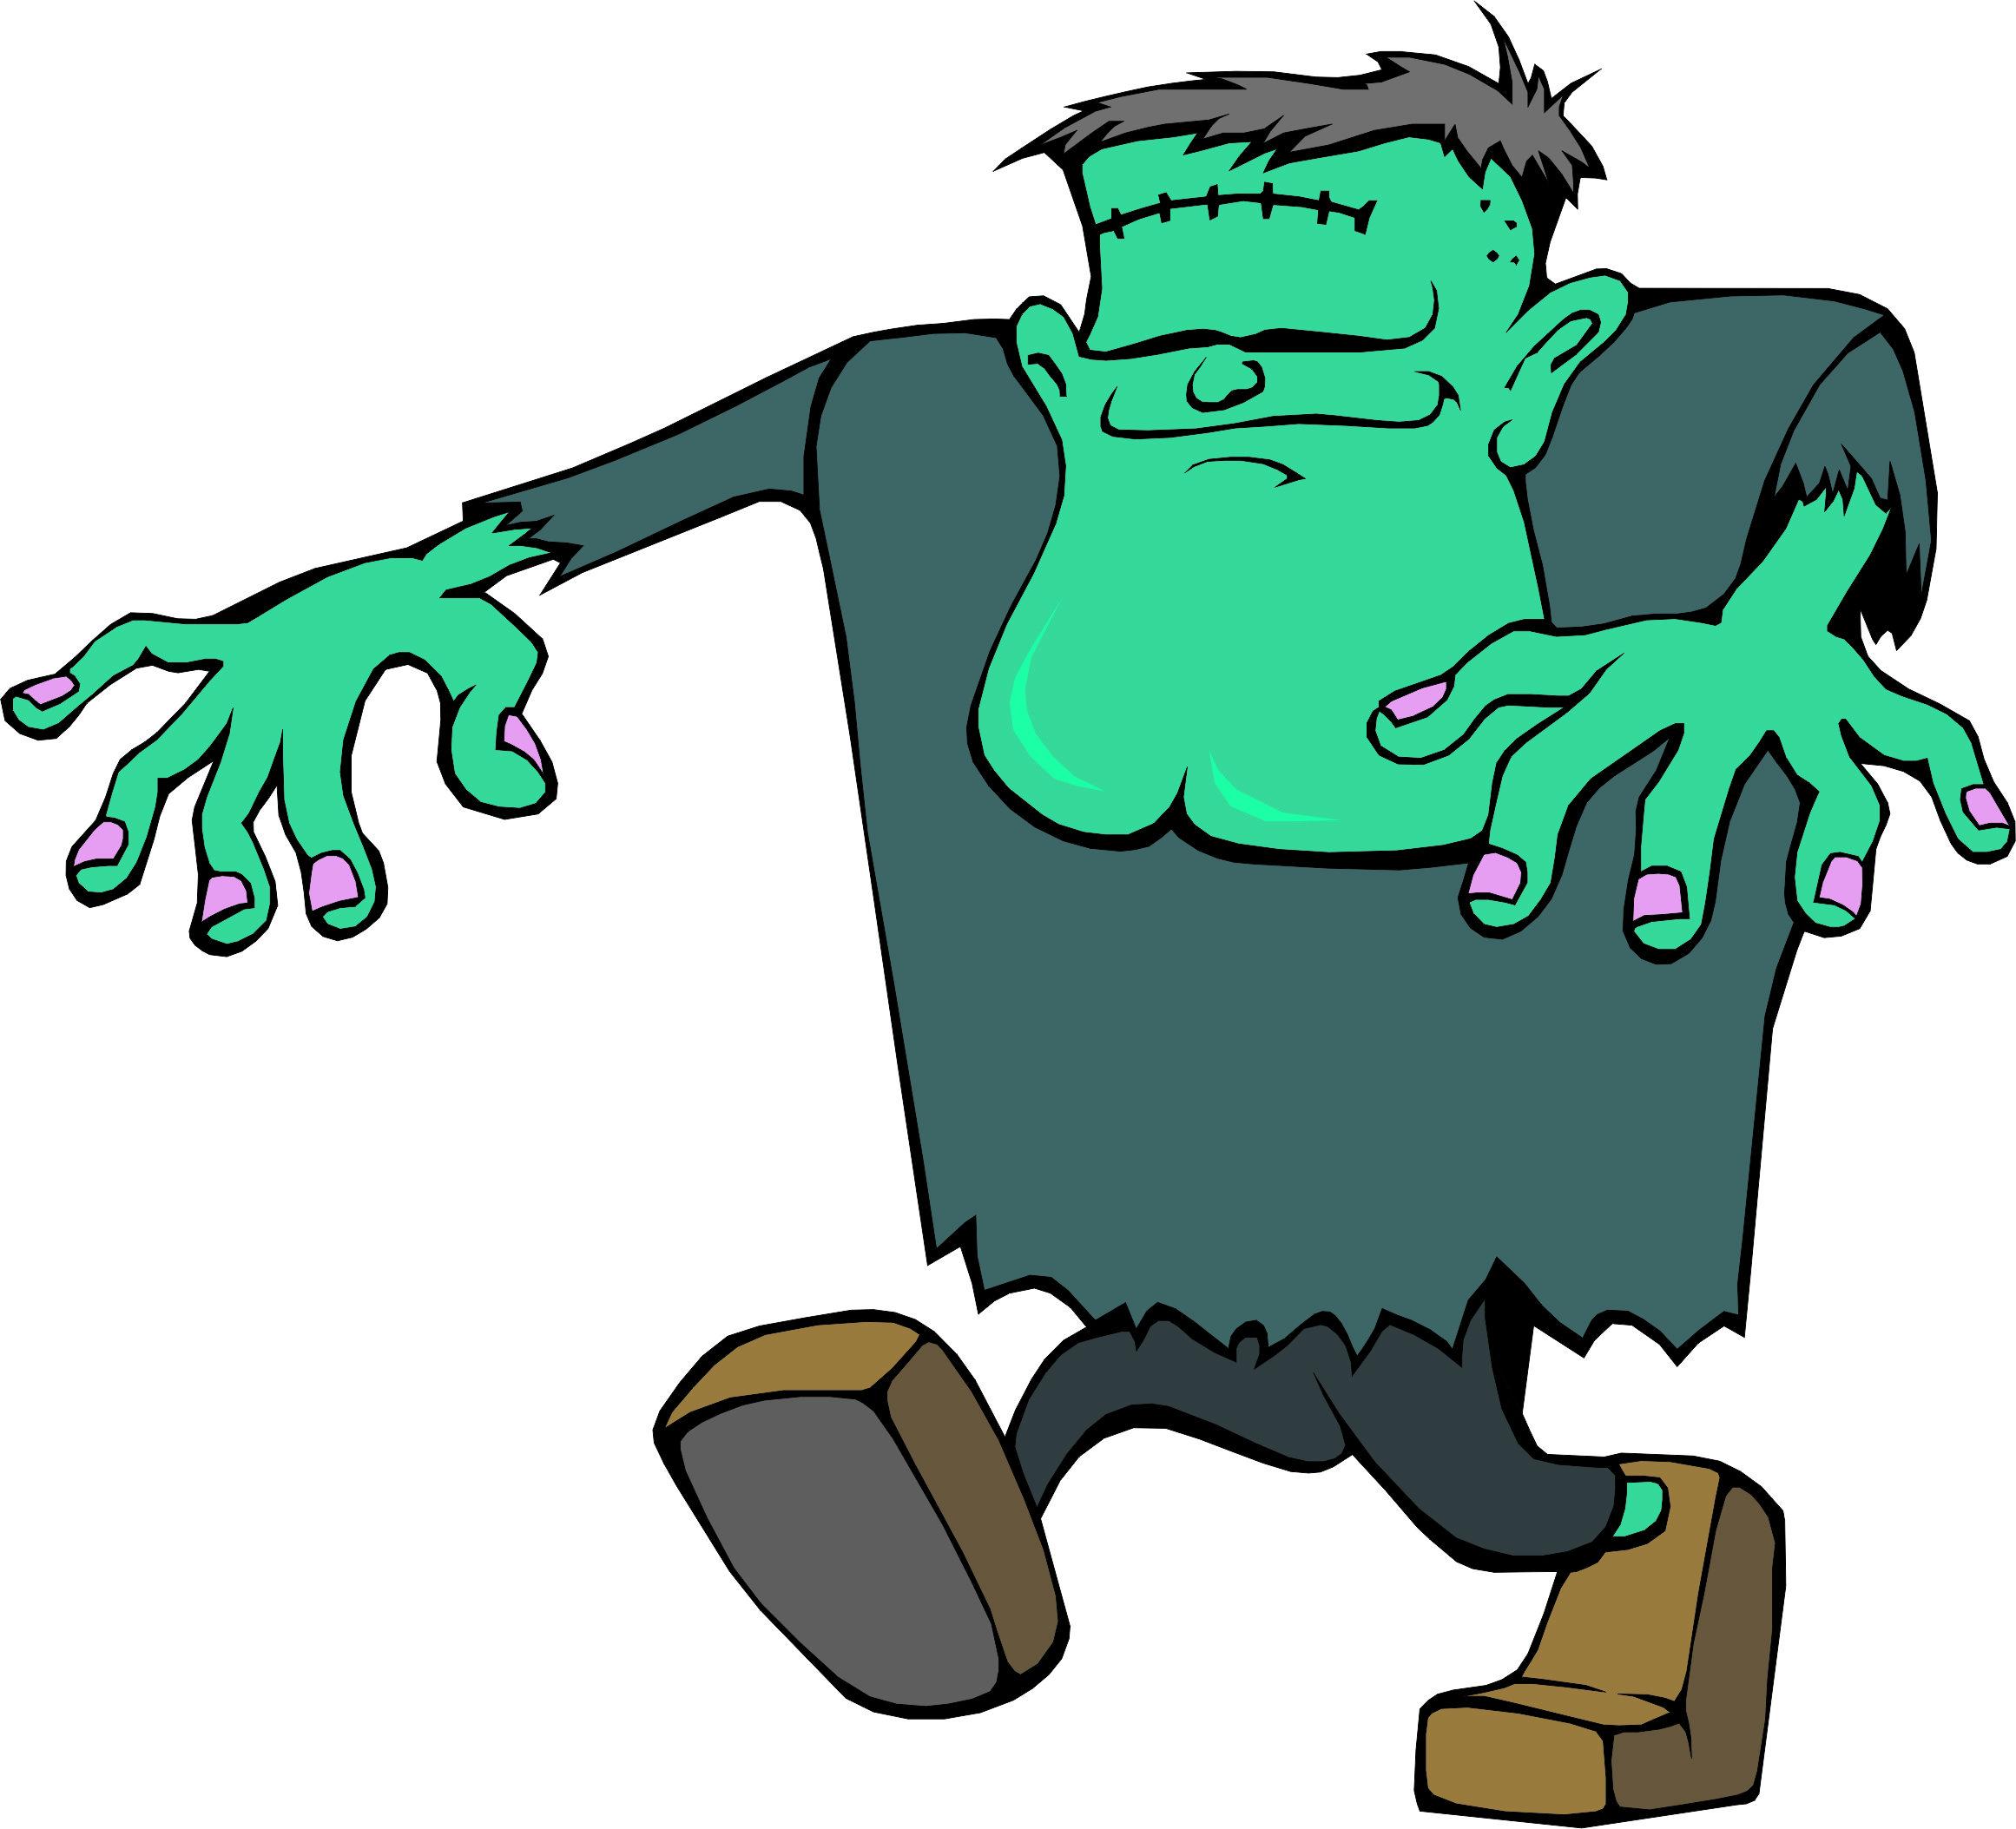 Free Frankenstein Cartoon Images, Download Free Clip Art.